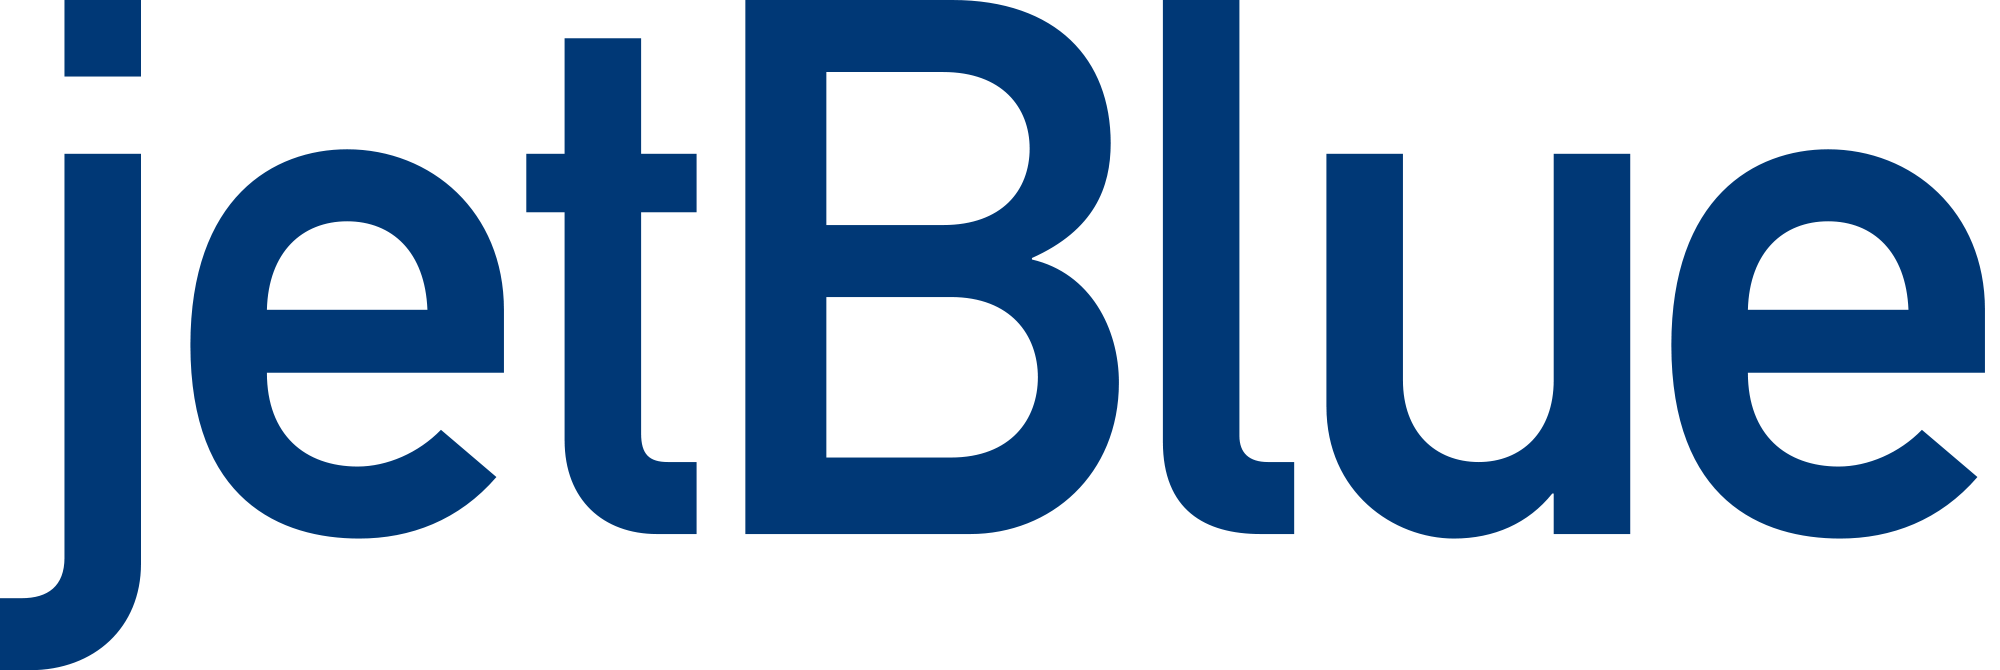 jetblue_logo.png